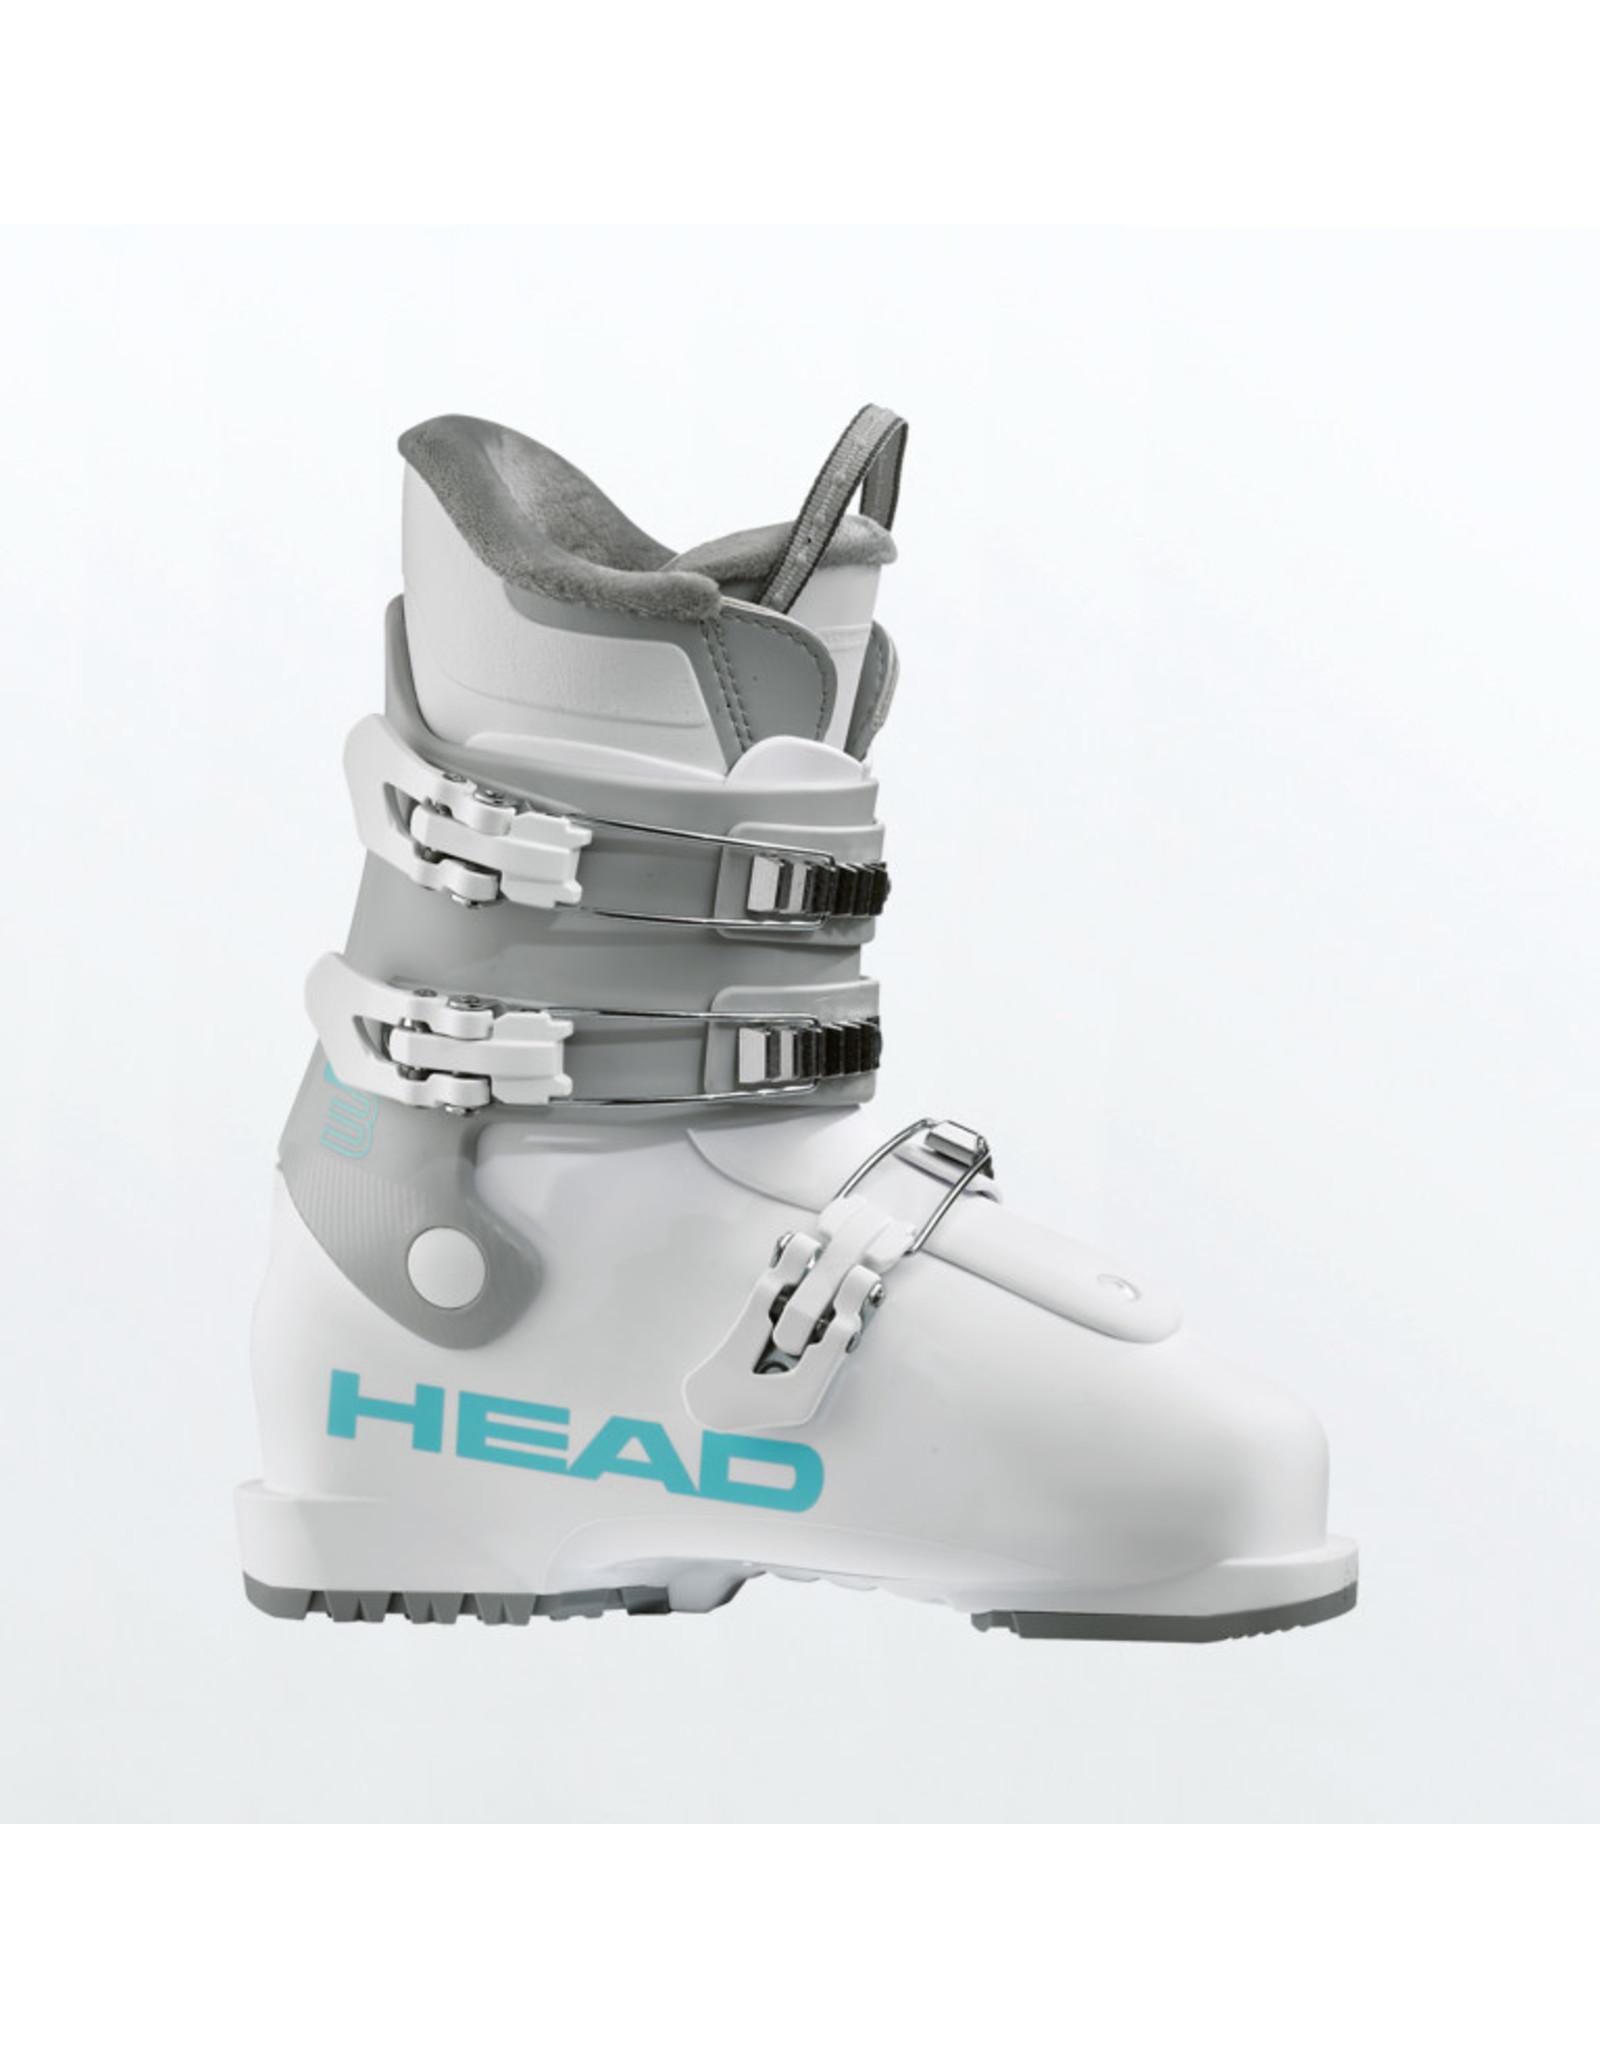 Head HEAD Z 3   WHITE / GRAY F20